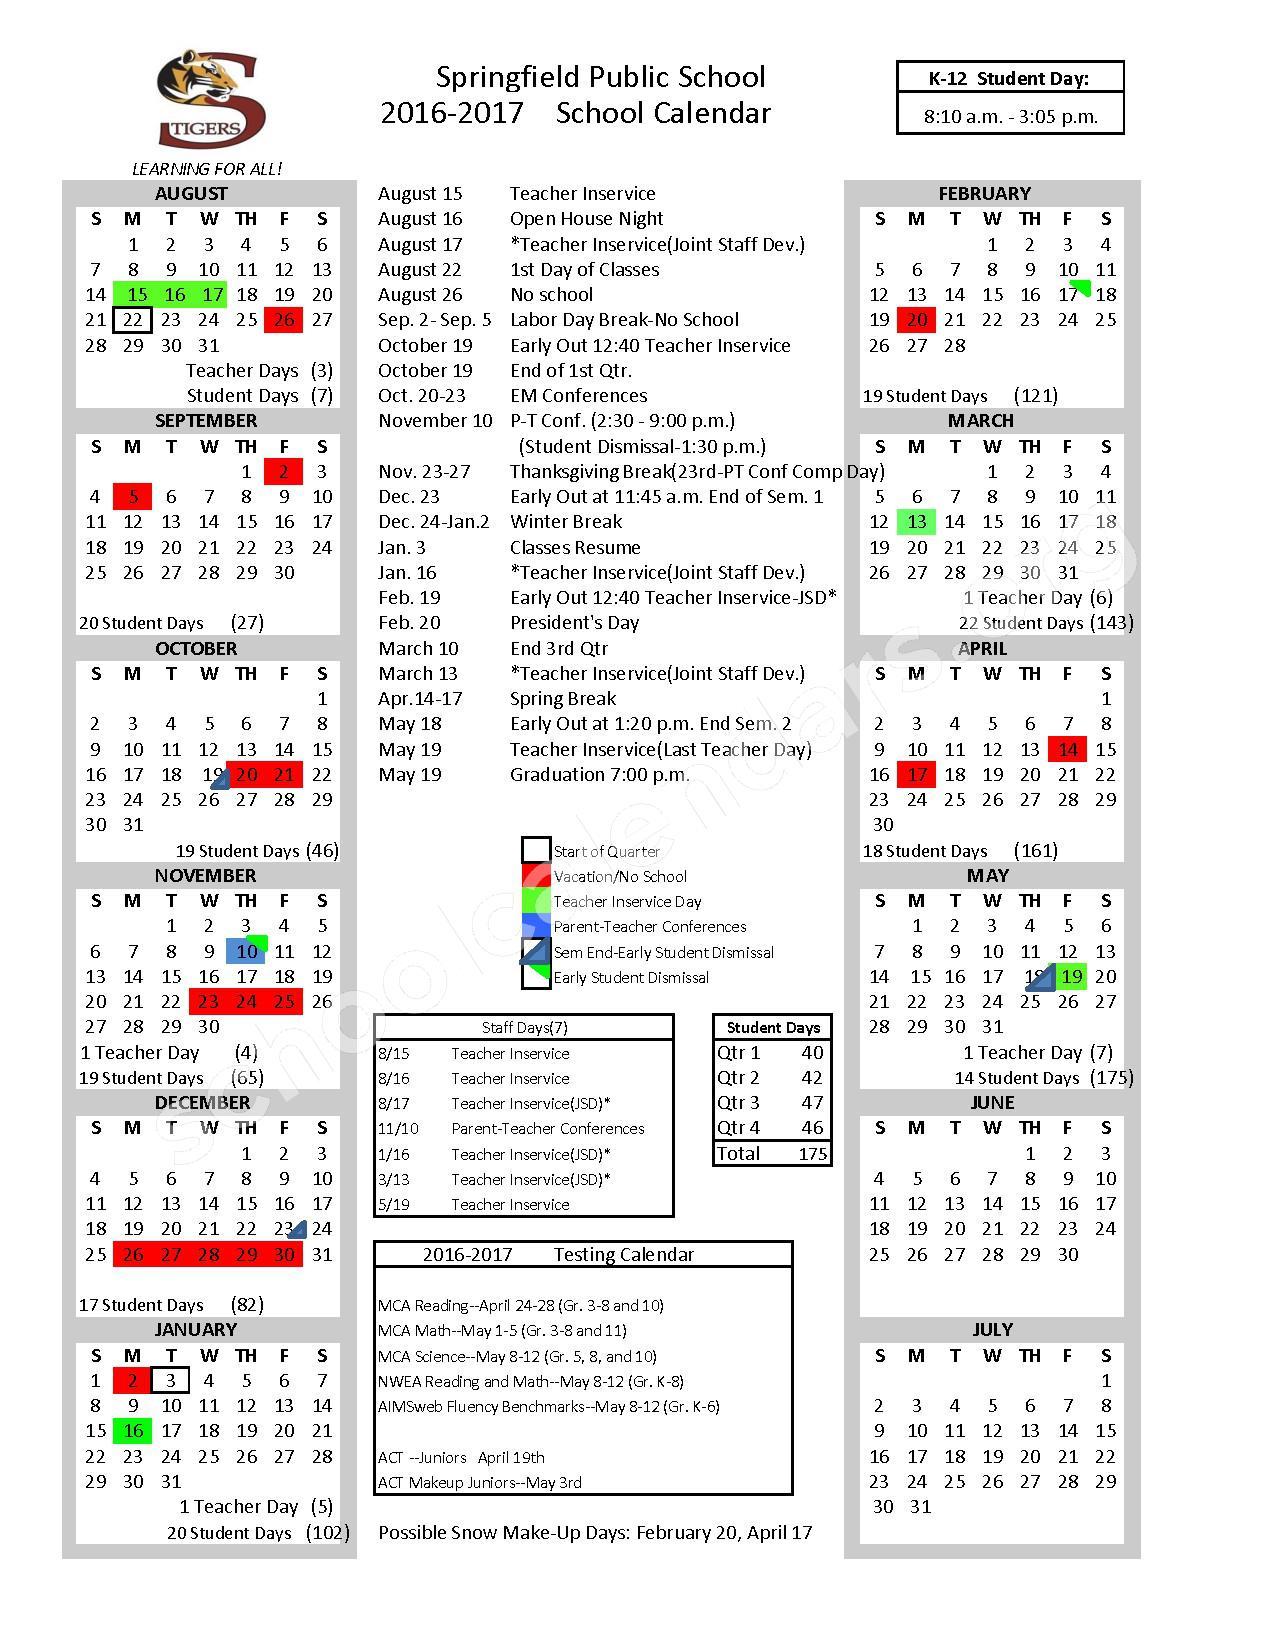 2016 2017 School Calendar